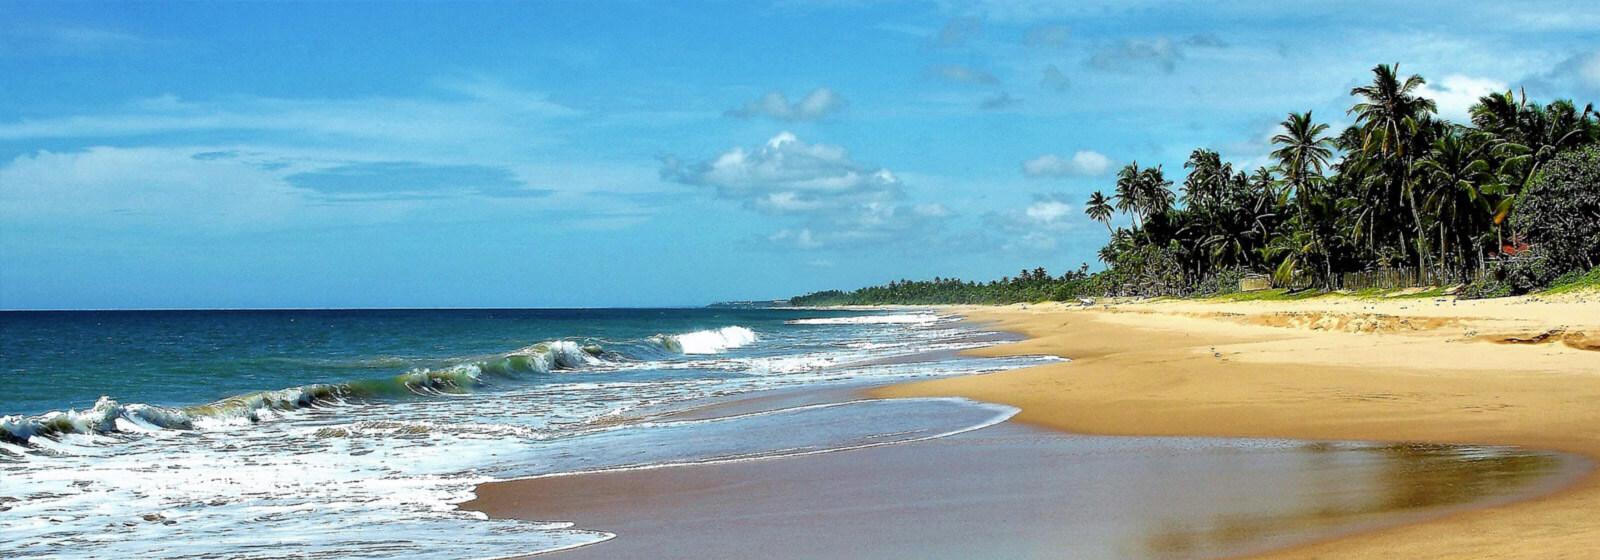 Beach image slide